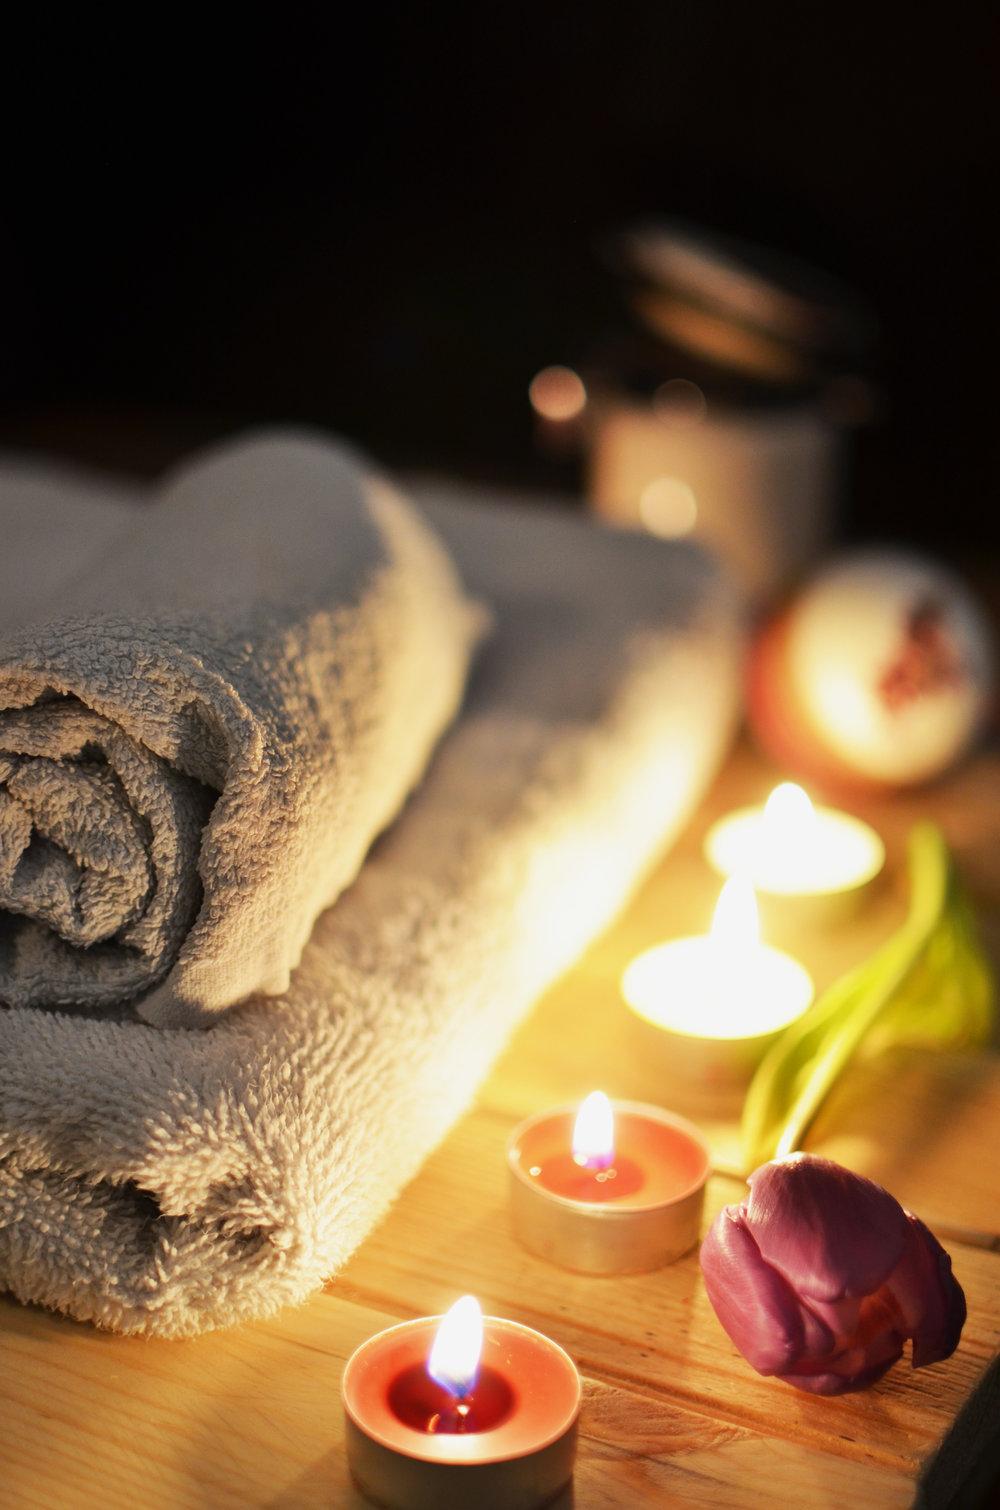 candlelight bath.jpg